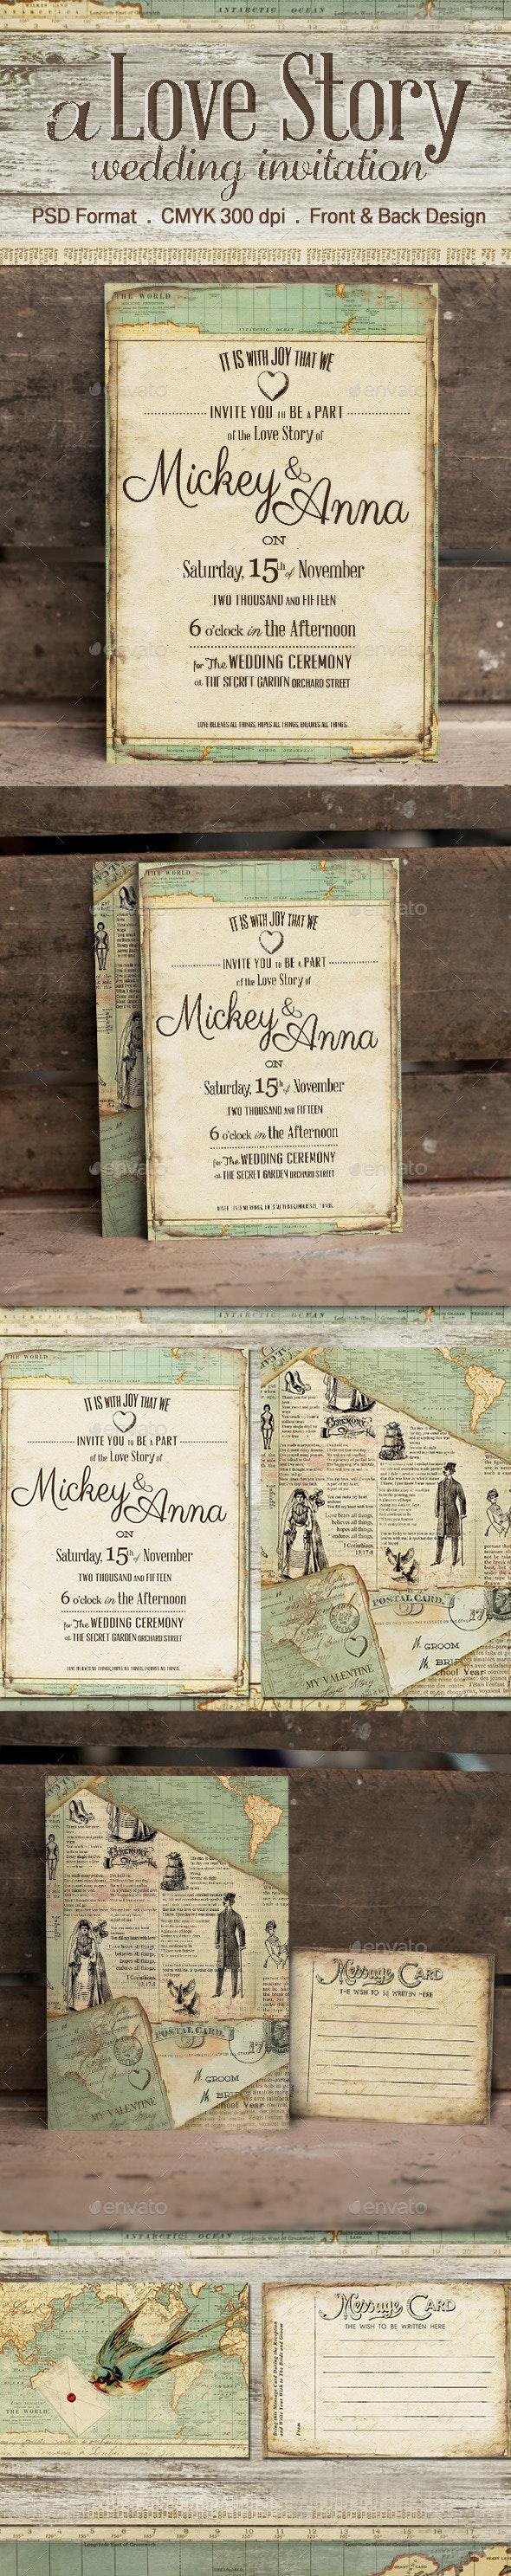 The Journey Wedding Invitation - Weddings Cards & Invites